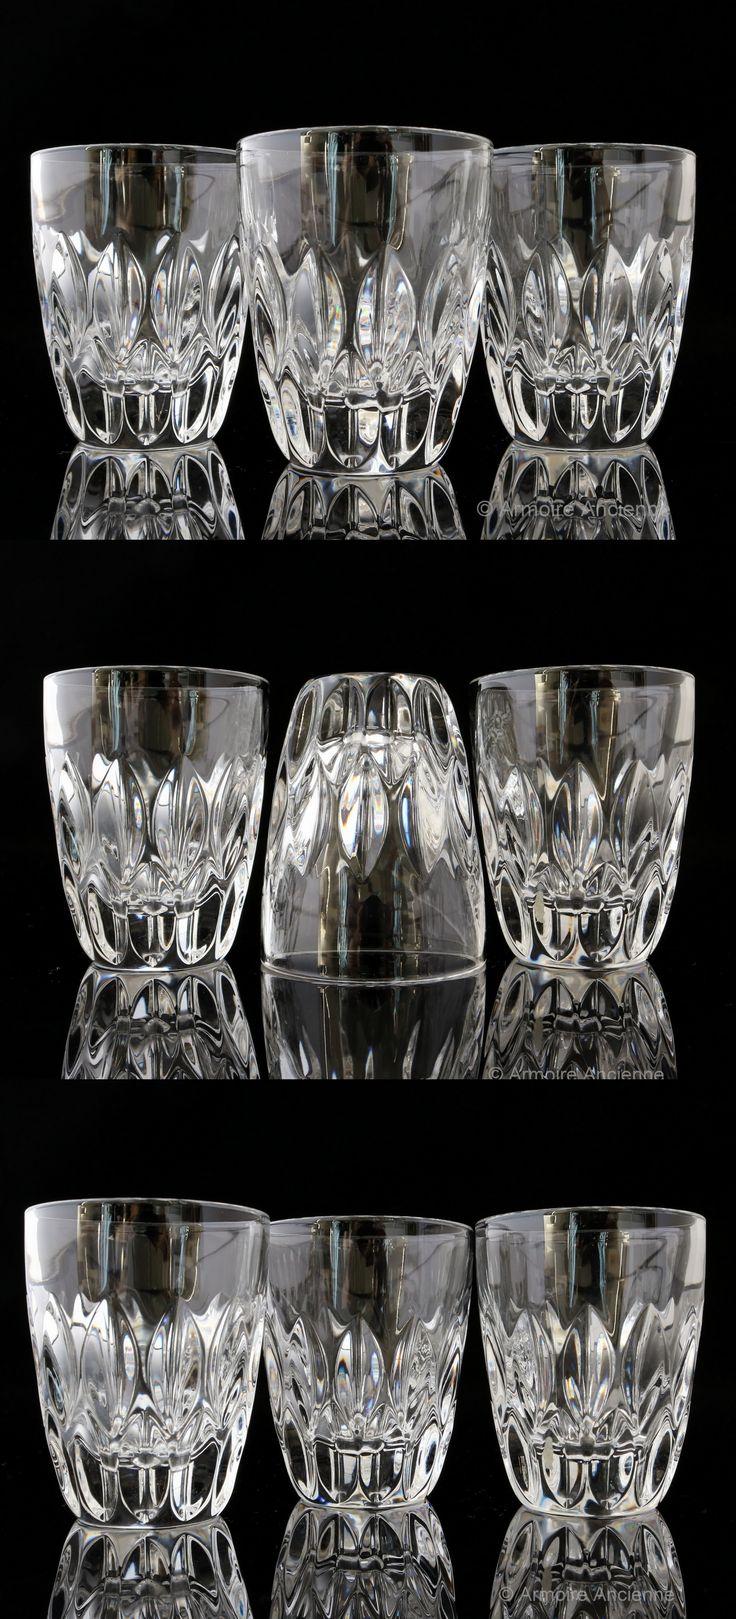 best vintage crystal glasses  barware  bar cart accessories  - cut lead crystal shot glasses set of   german crystalware  midcentury barware bar cart accessories